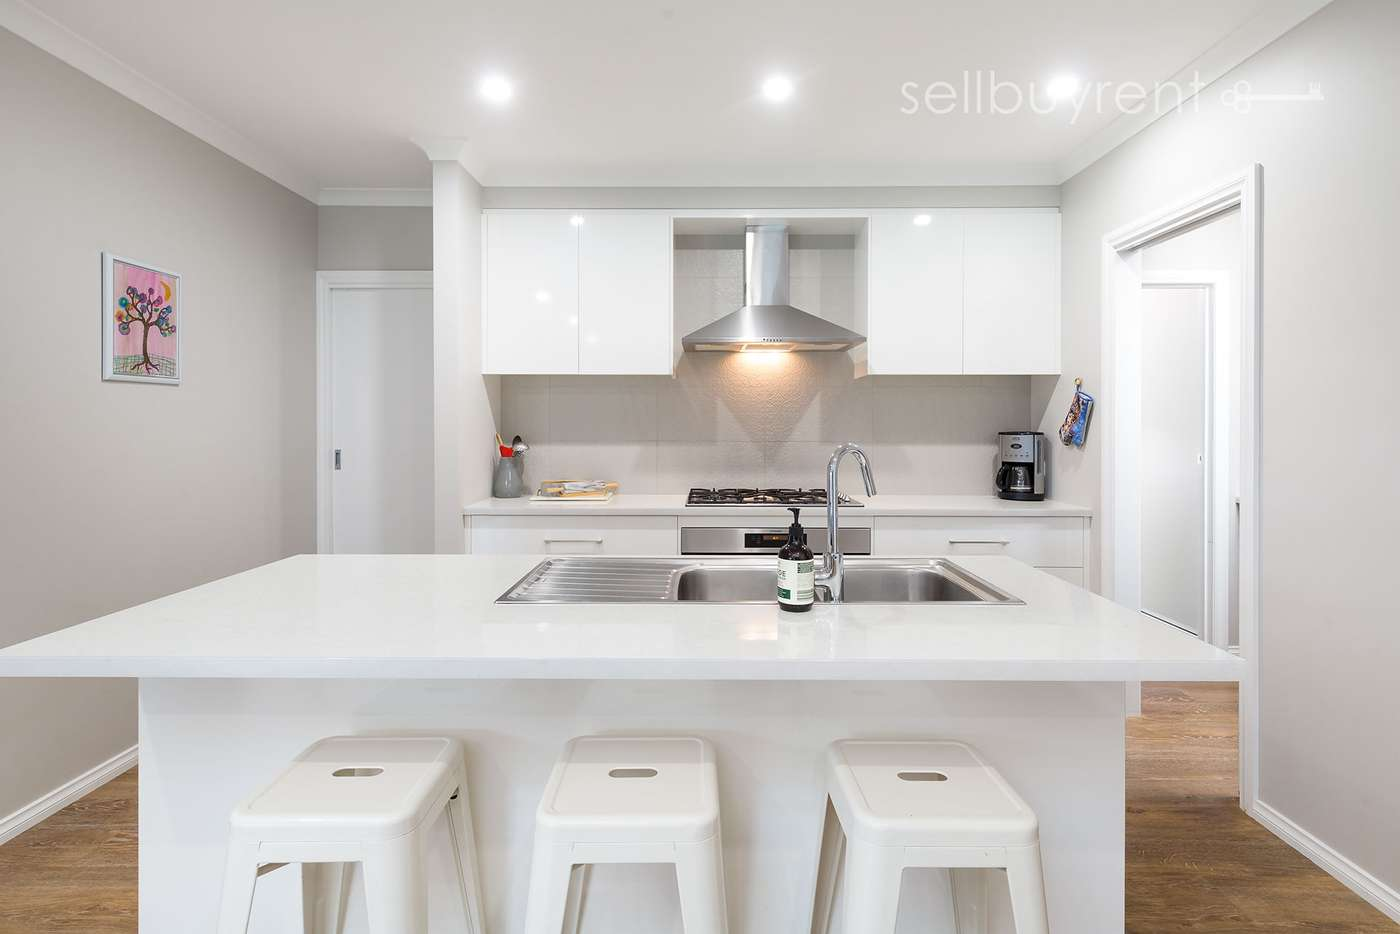 Fifth view of Homely house listing, 18 CALLUS STREET, Killara VIC 3691